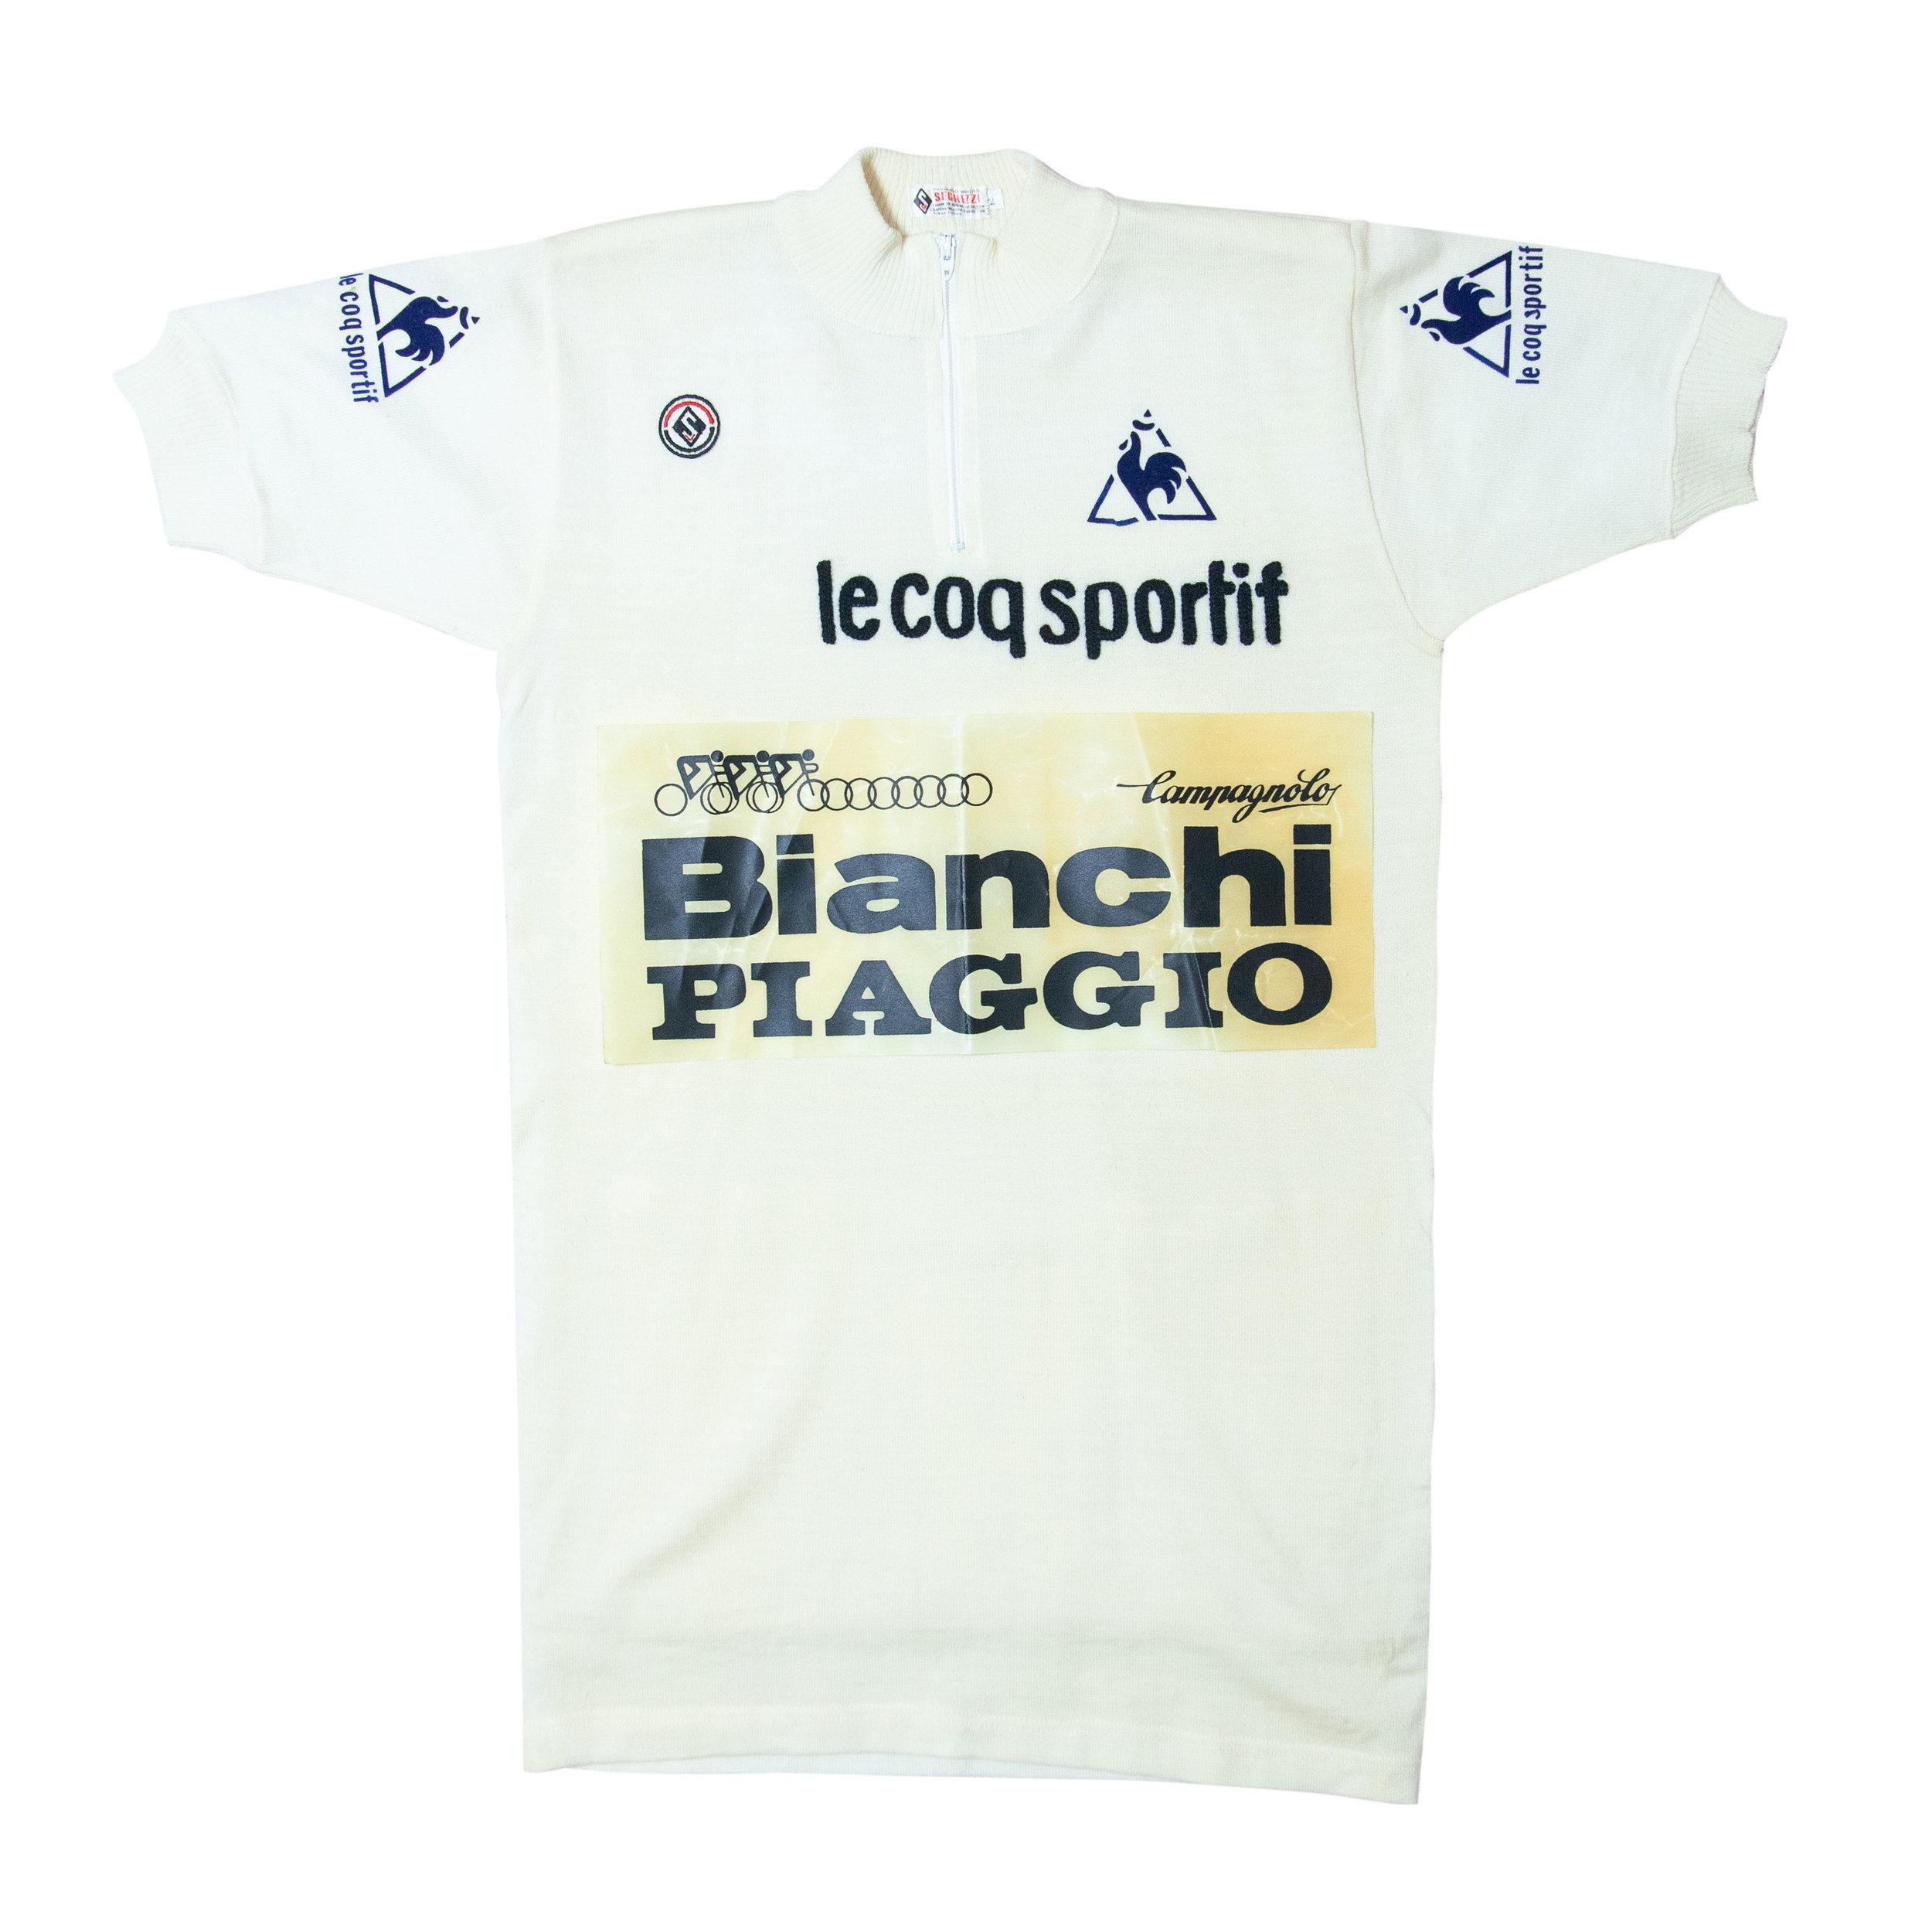 Bianchi-Piaggio.jpg